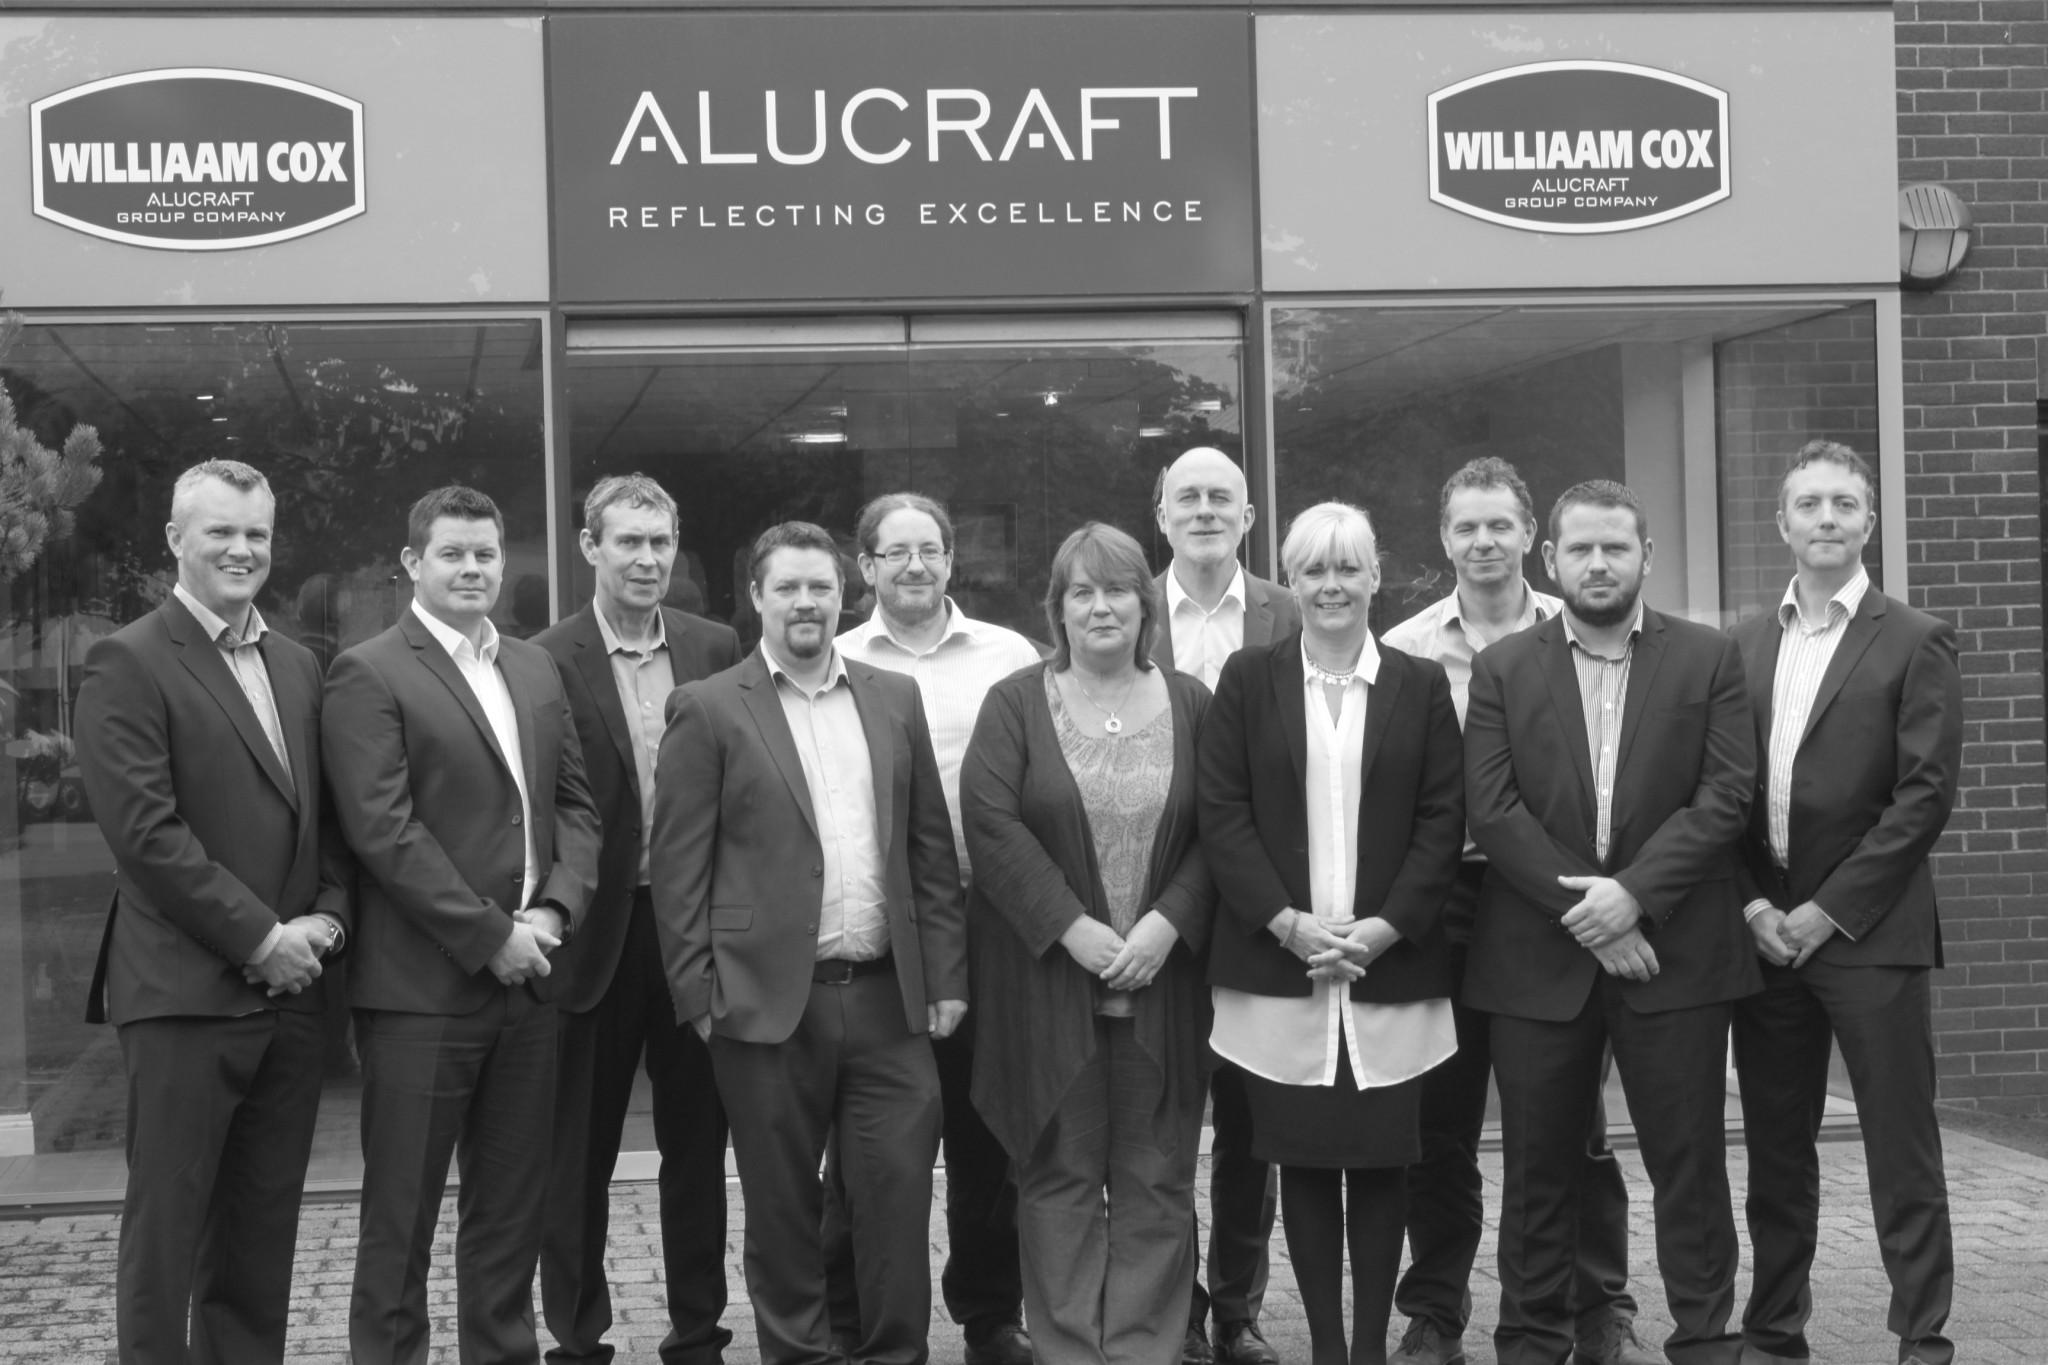 Williaam Cox Team Alucraft Group